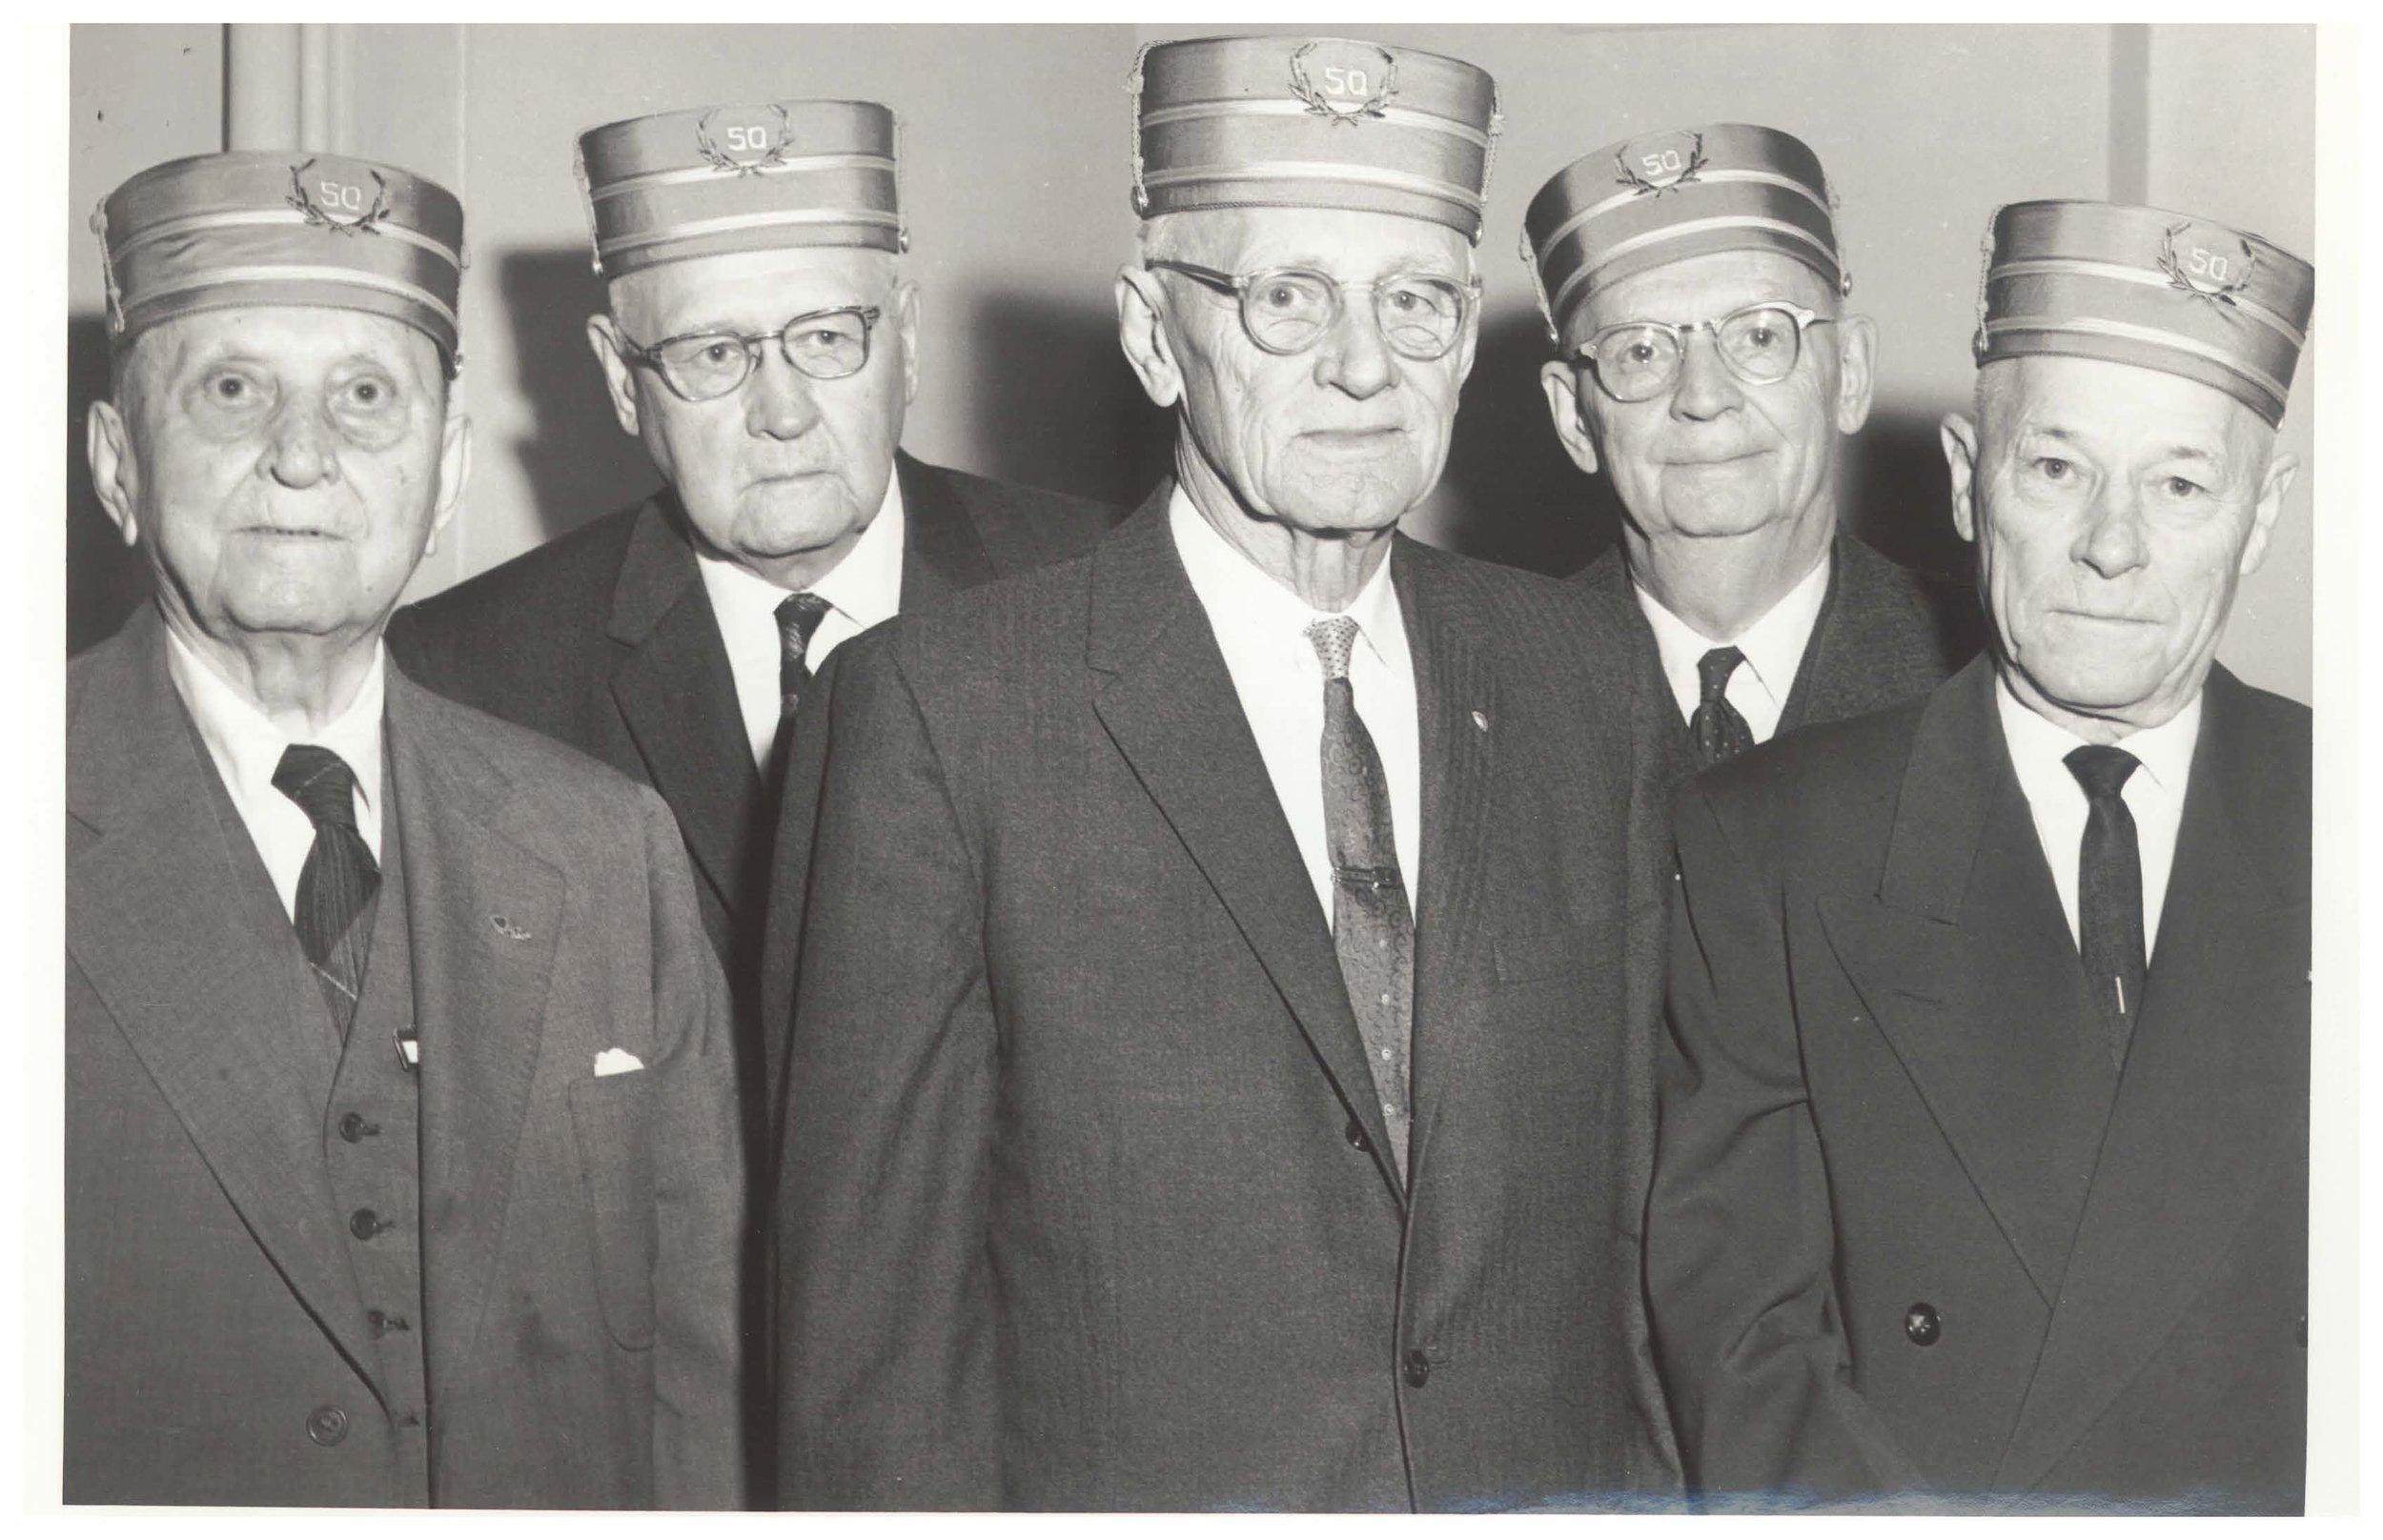 50 Year Men Nov 17 1961.jpg